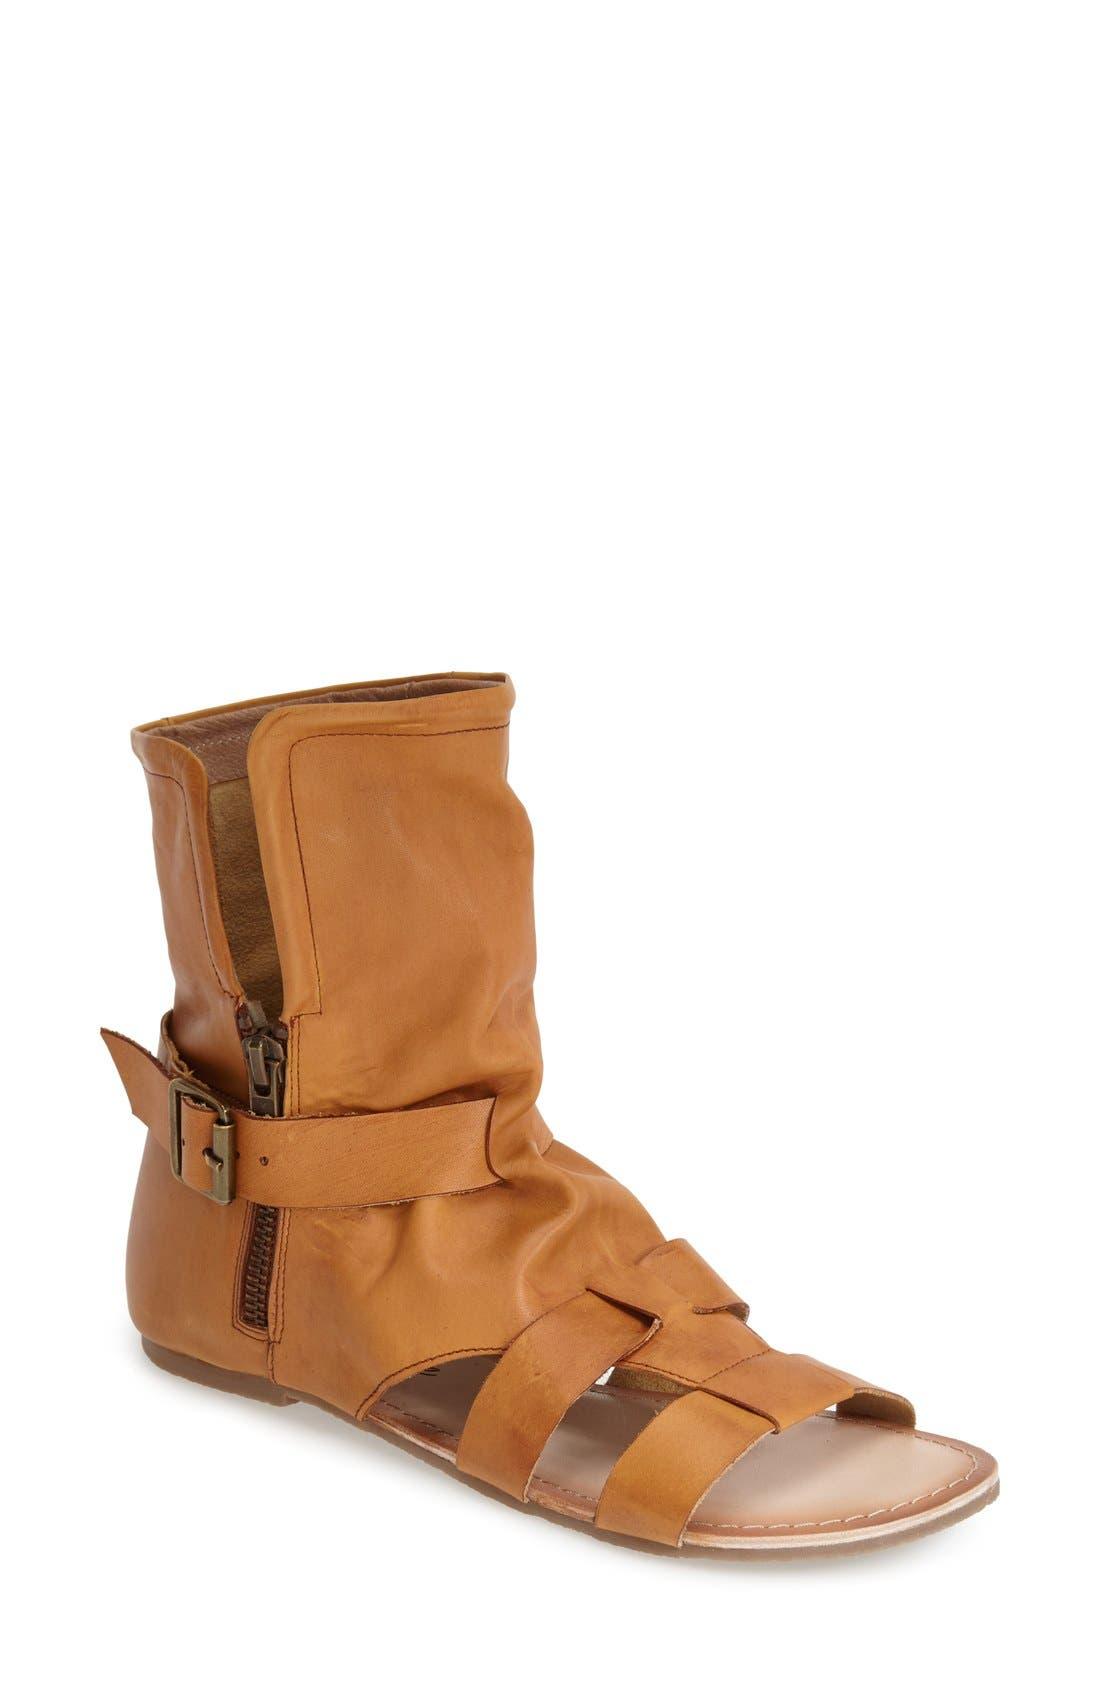 Alternate Image 1 Selected - Matisse Gladiator Sandal (Women)